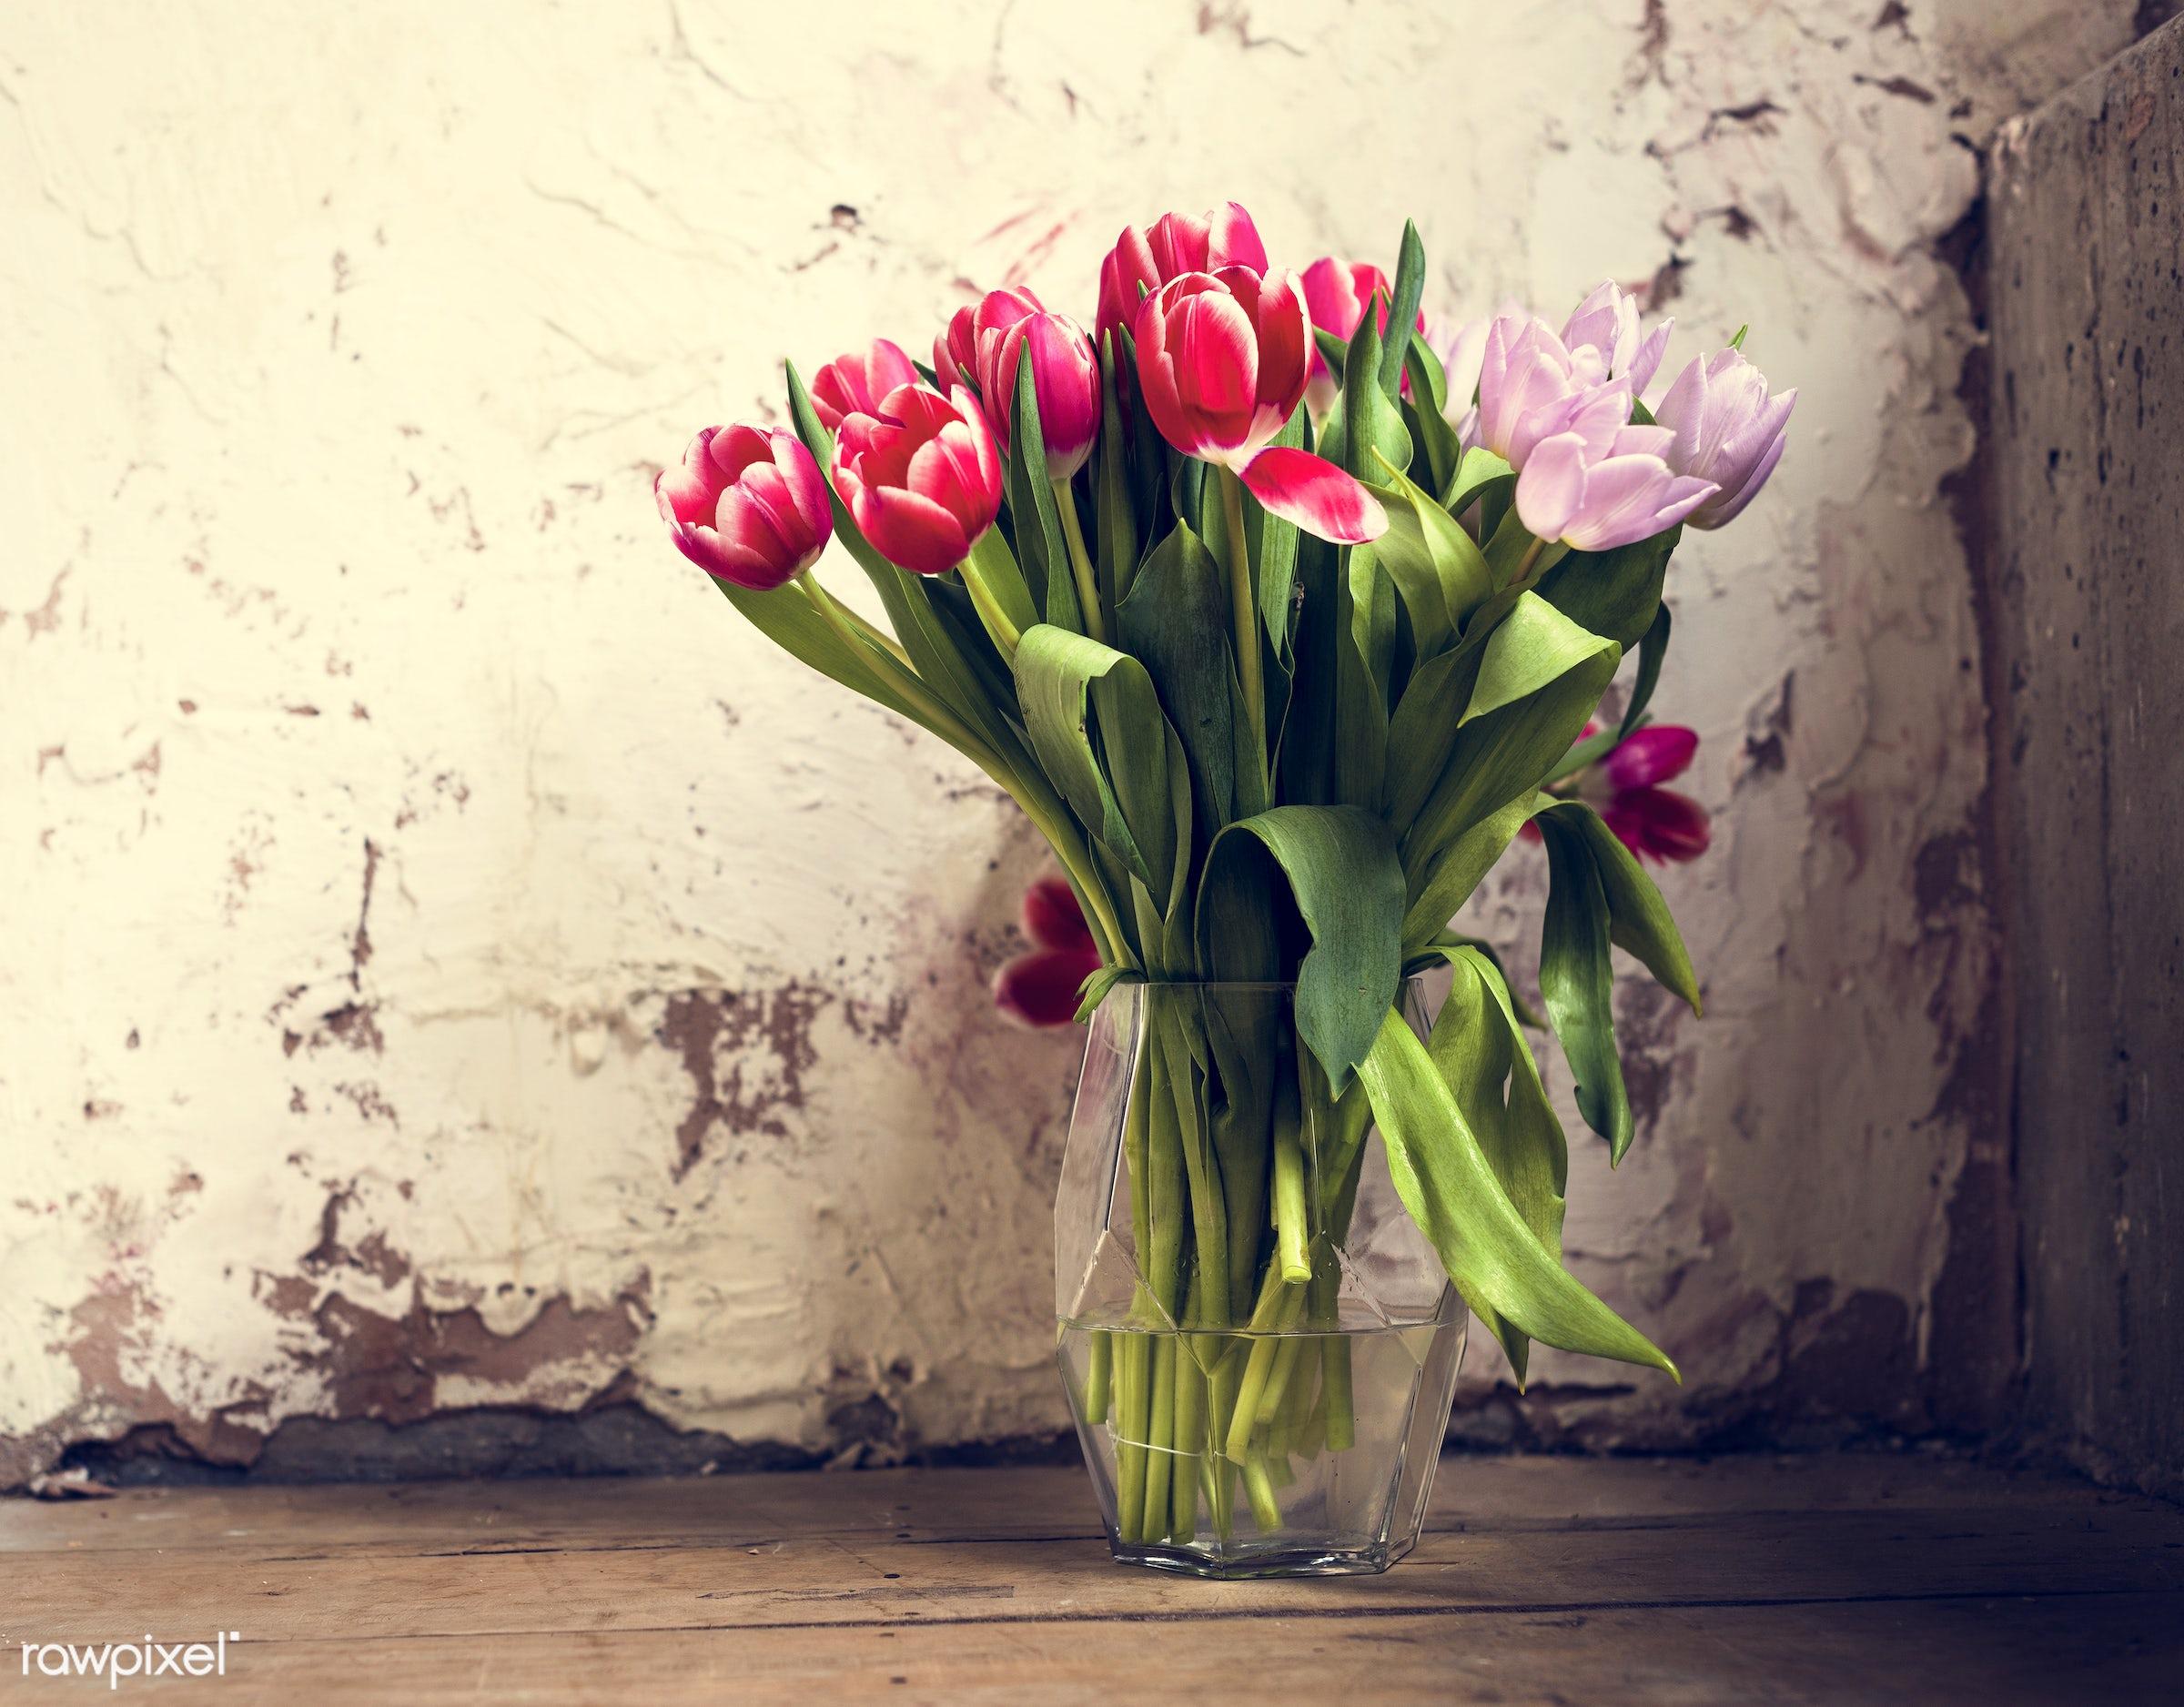 nobody, detail, show, leaf, leaves, decor, nature, jar, flowers, vase, refreshment, florist, present, arrangement, floor,...